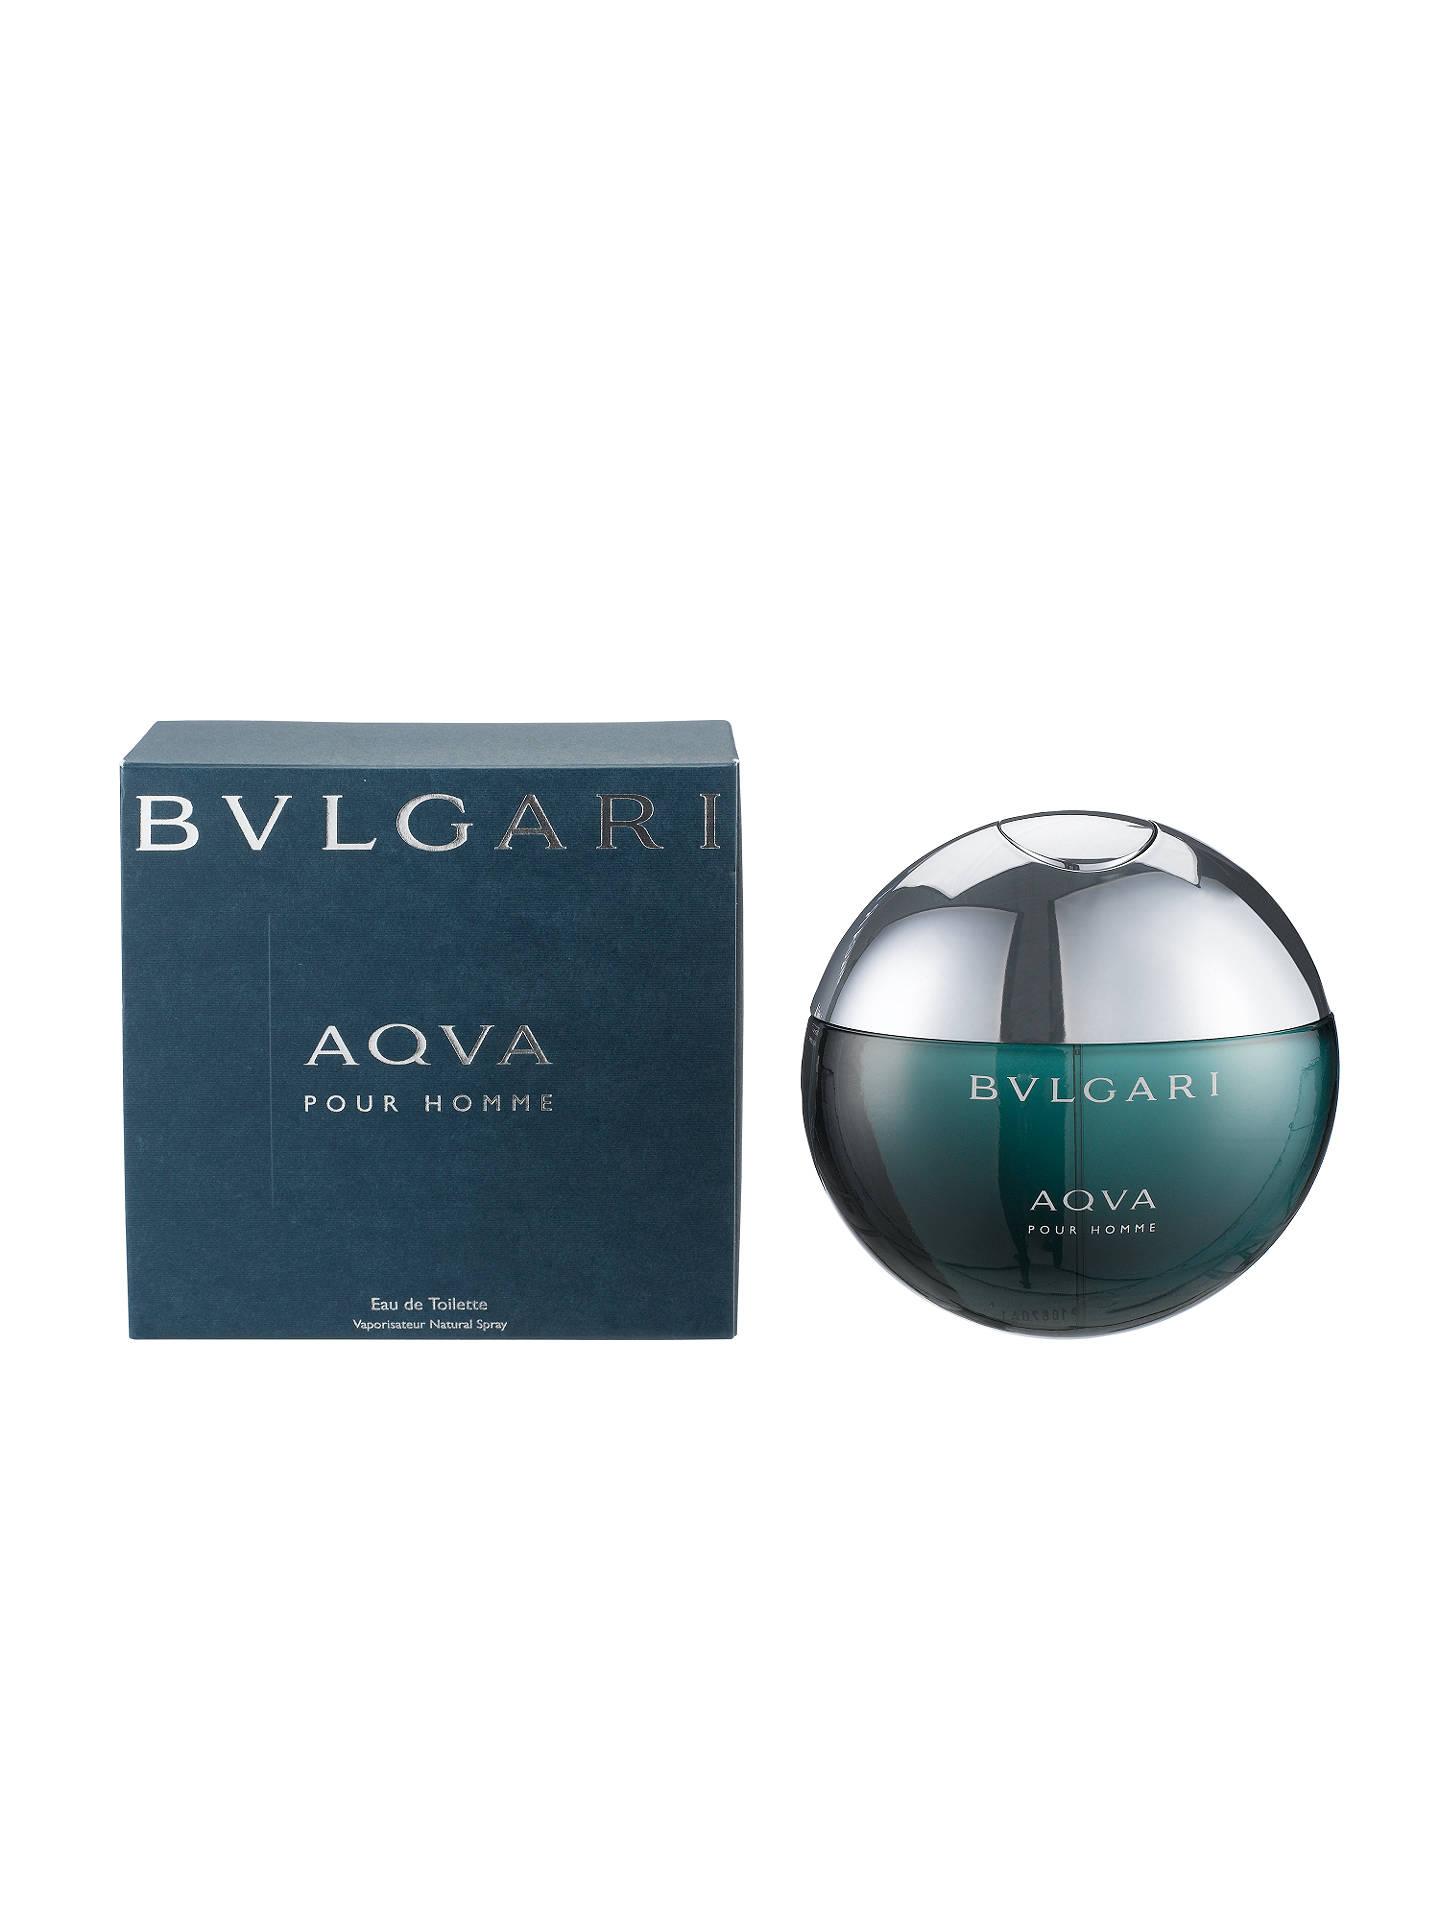 a4ae893c975aa Buy BVLGARI Aqua Pour Homme